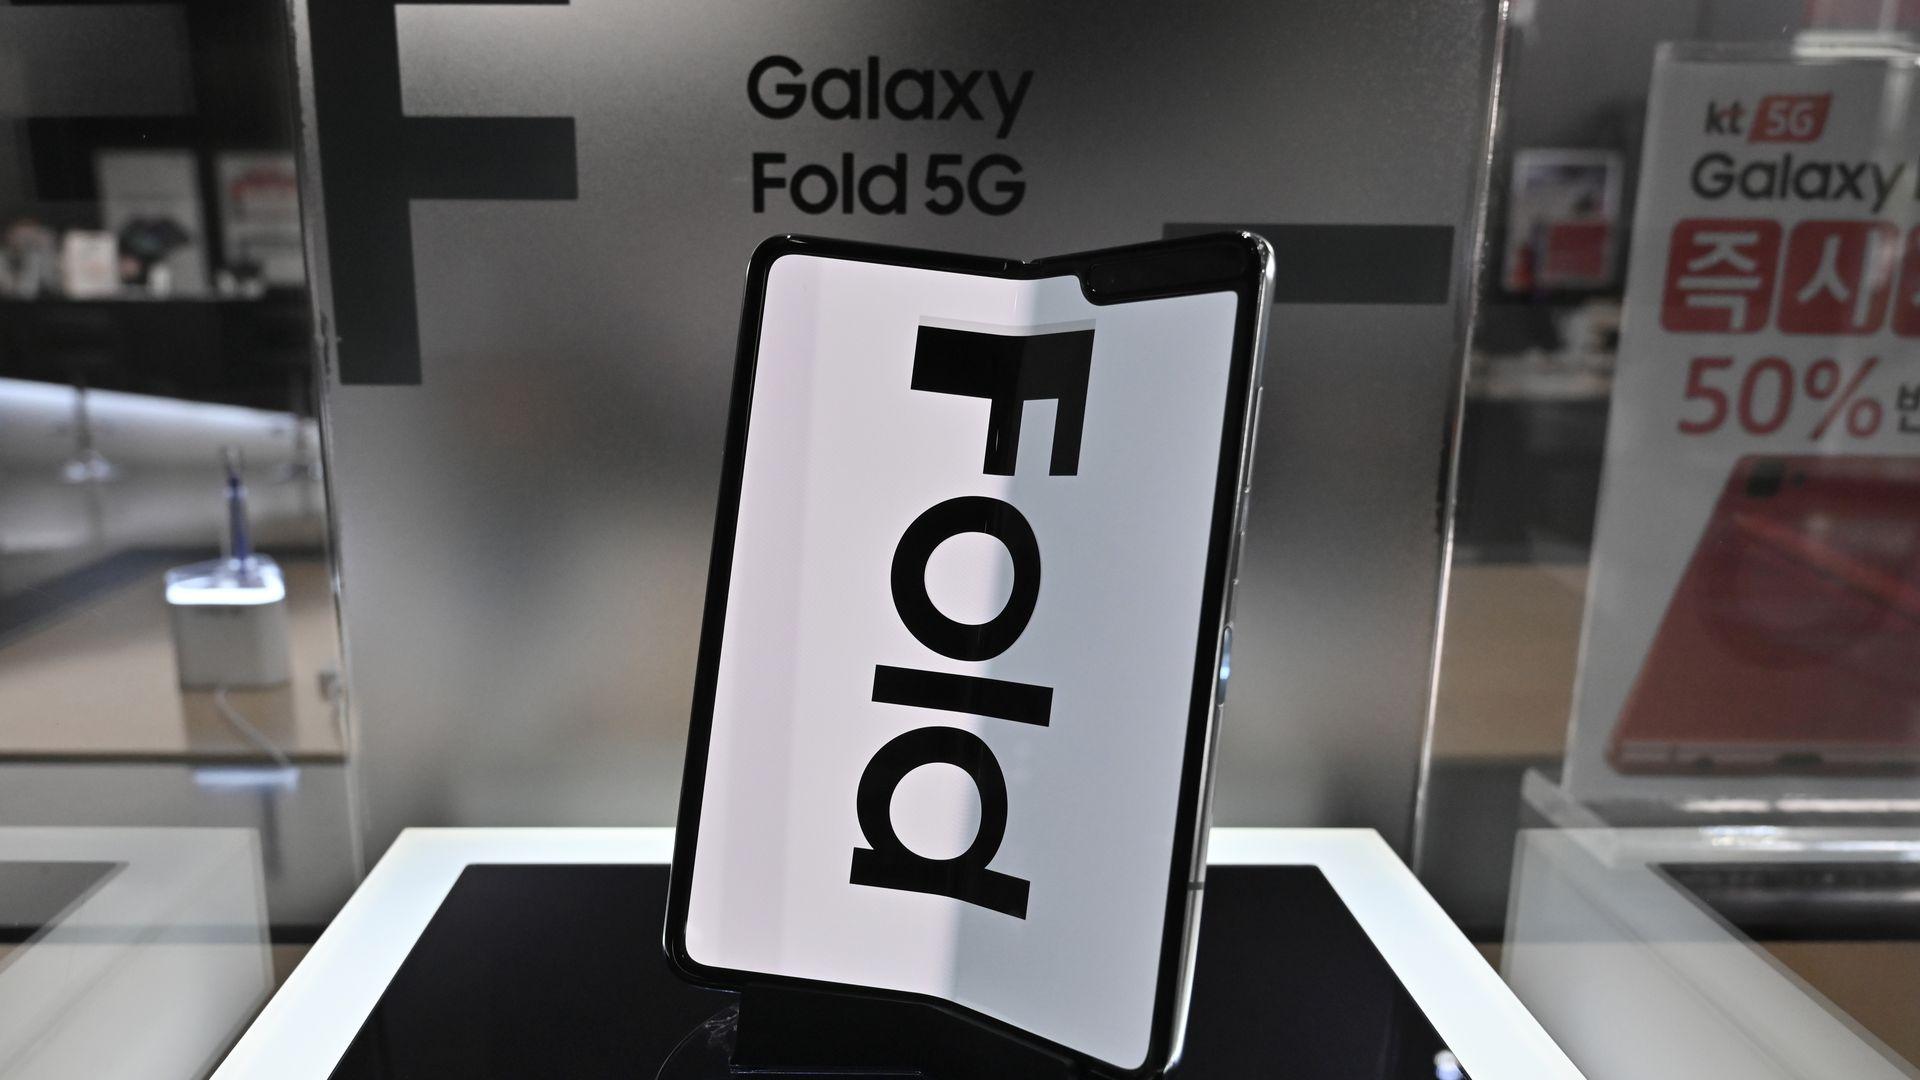 The Samsung Galaxy Fold